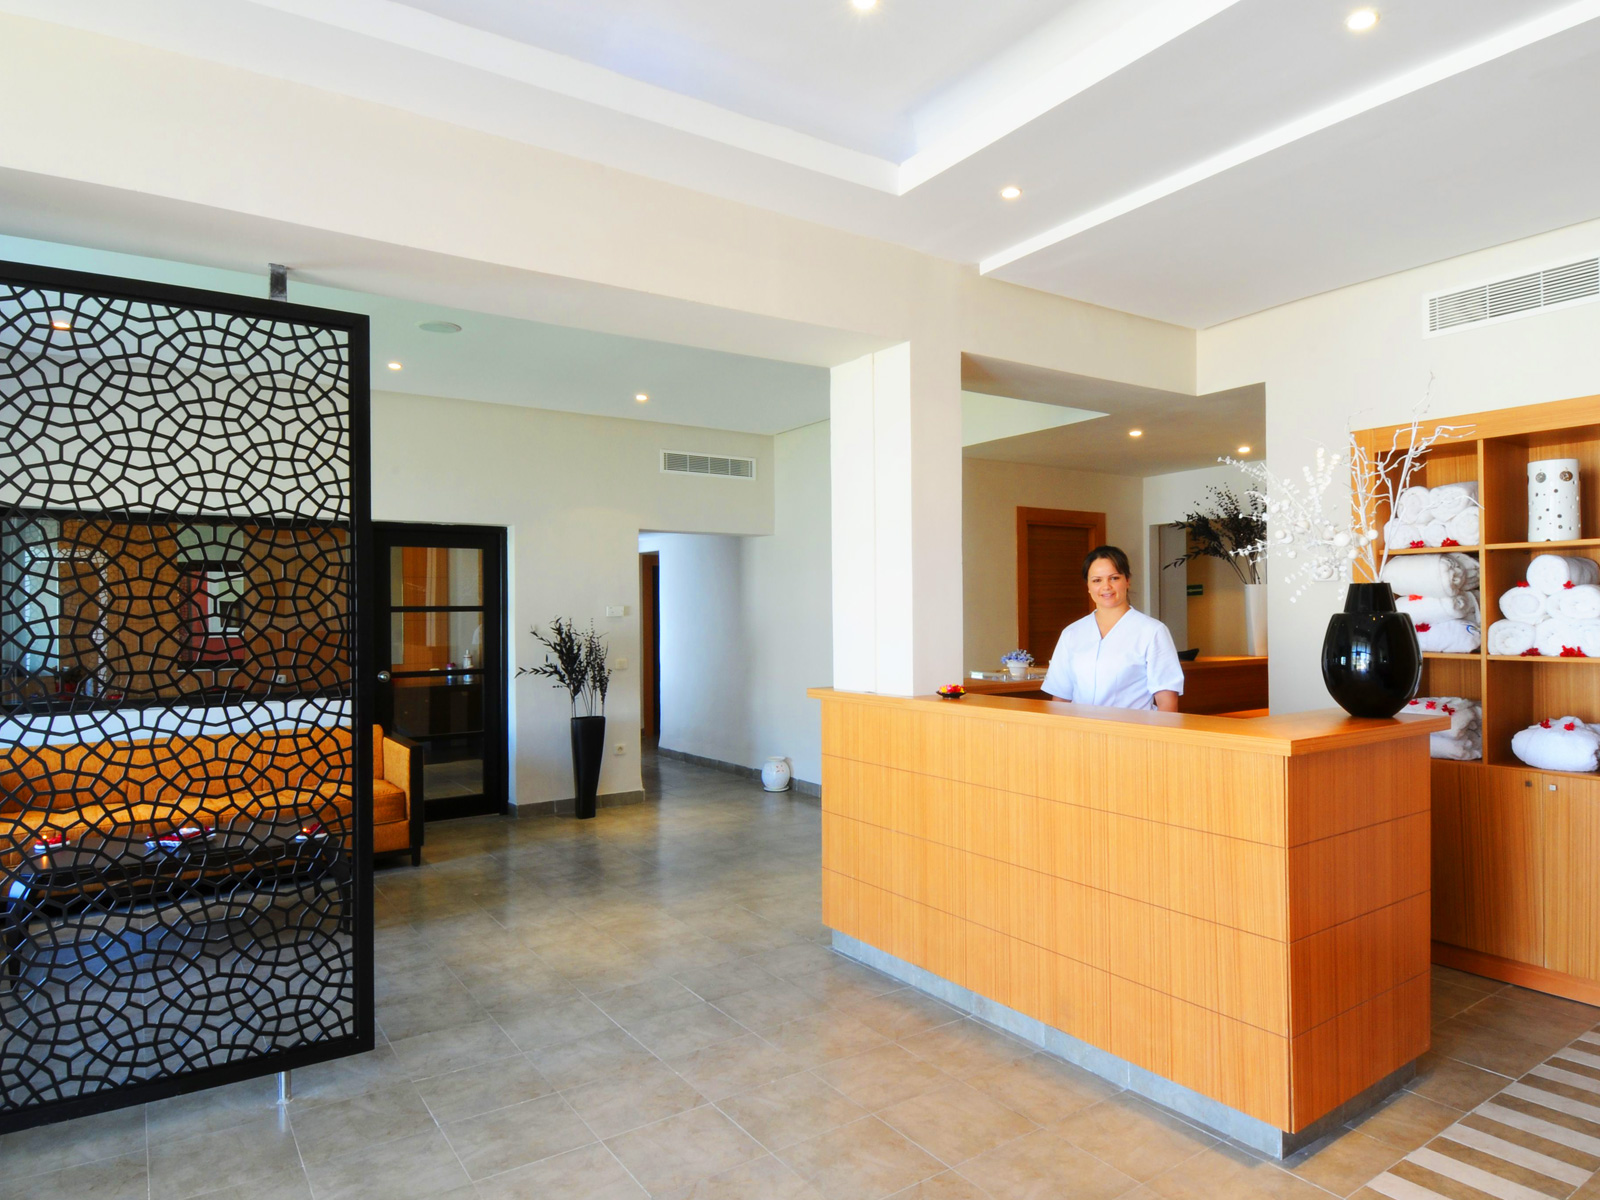 Spa Hotel Hammamet Nozha Beach - Vincci Hotels - Nozha Beach Spa